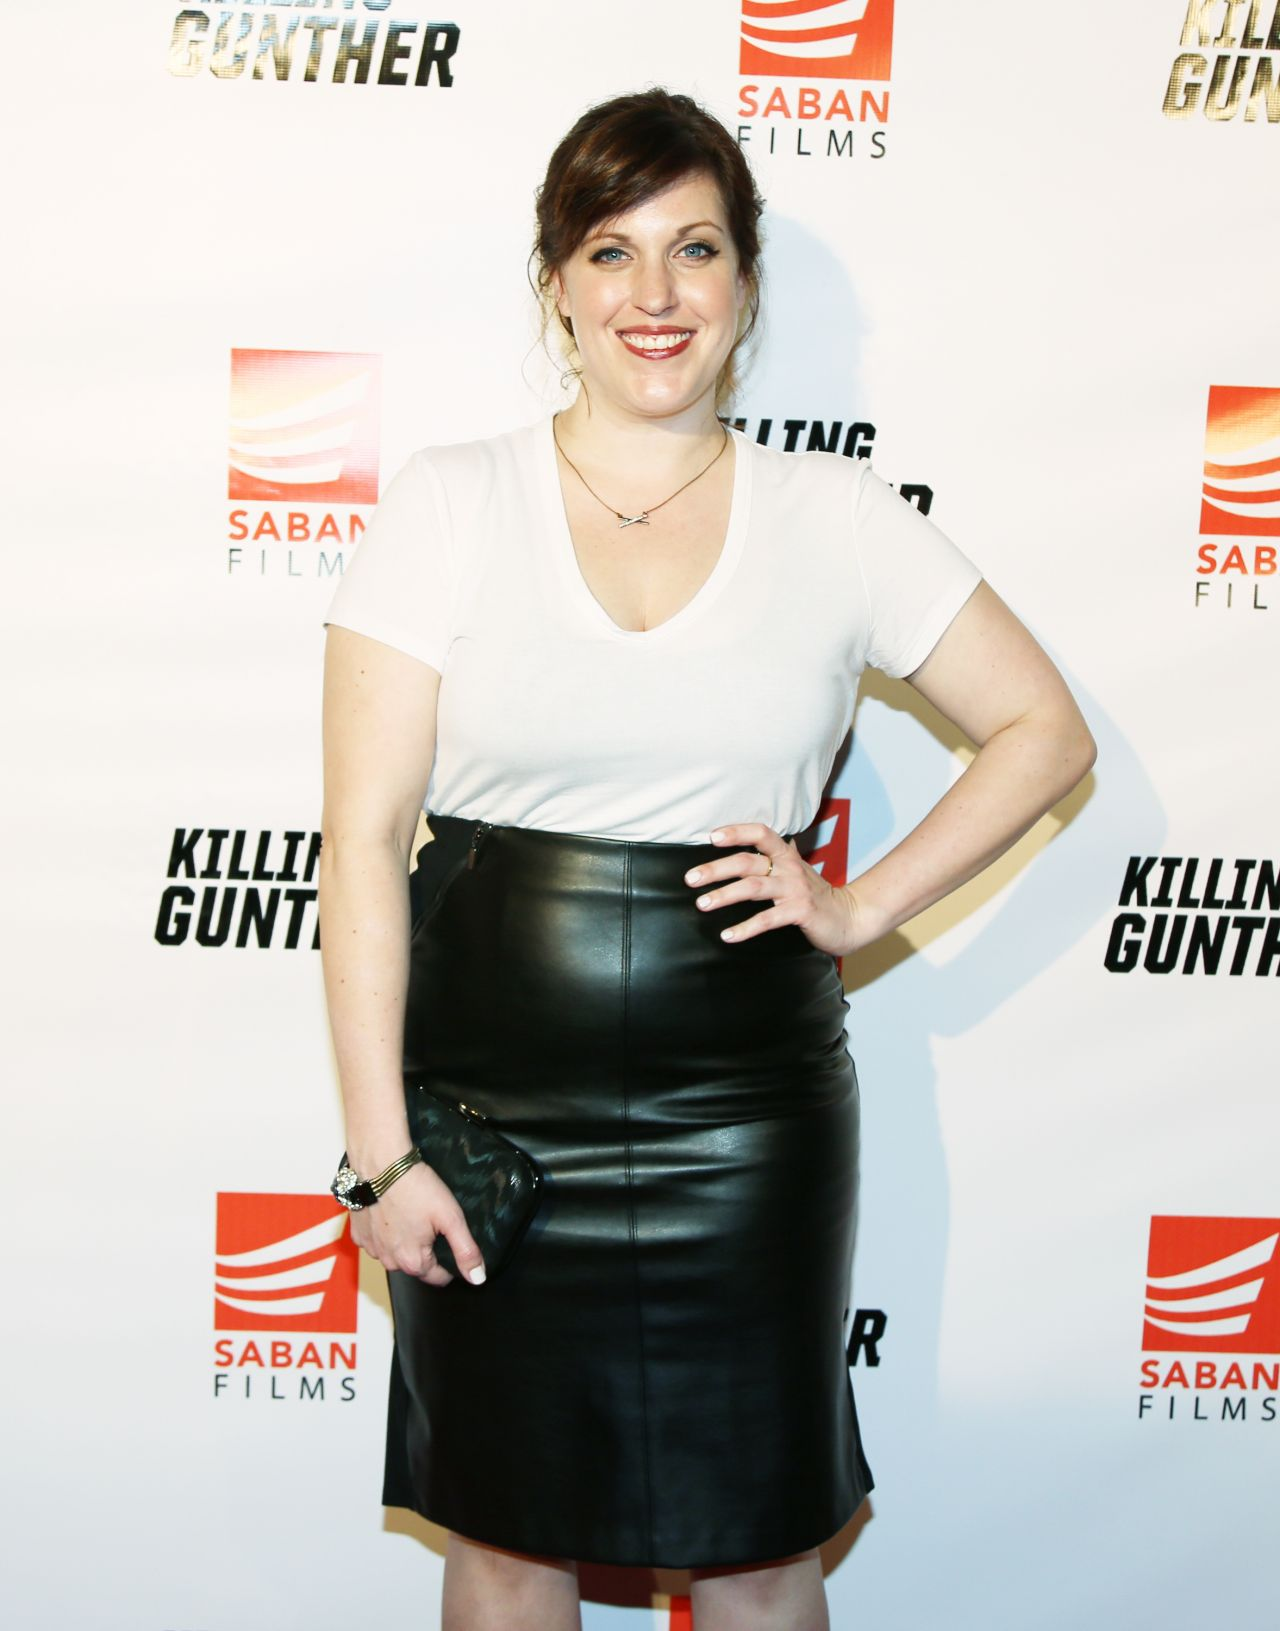 Allison tolman killing gunther film screening in los angeles